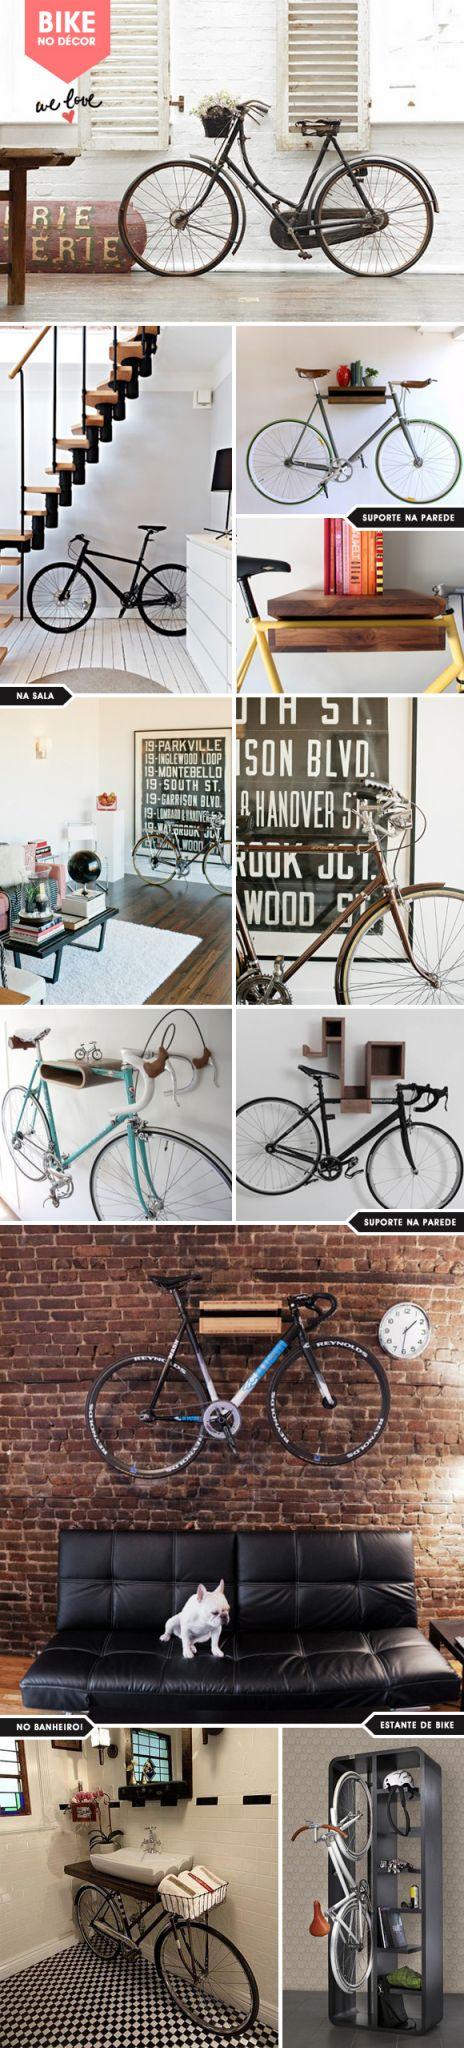 Achados da Bia - Bike no décor